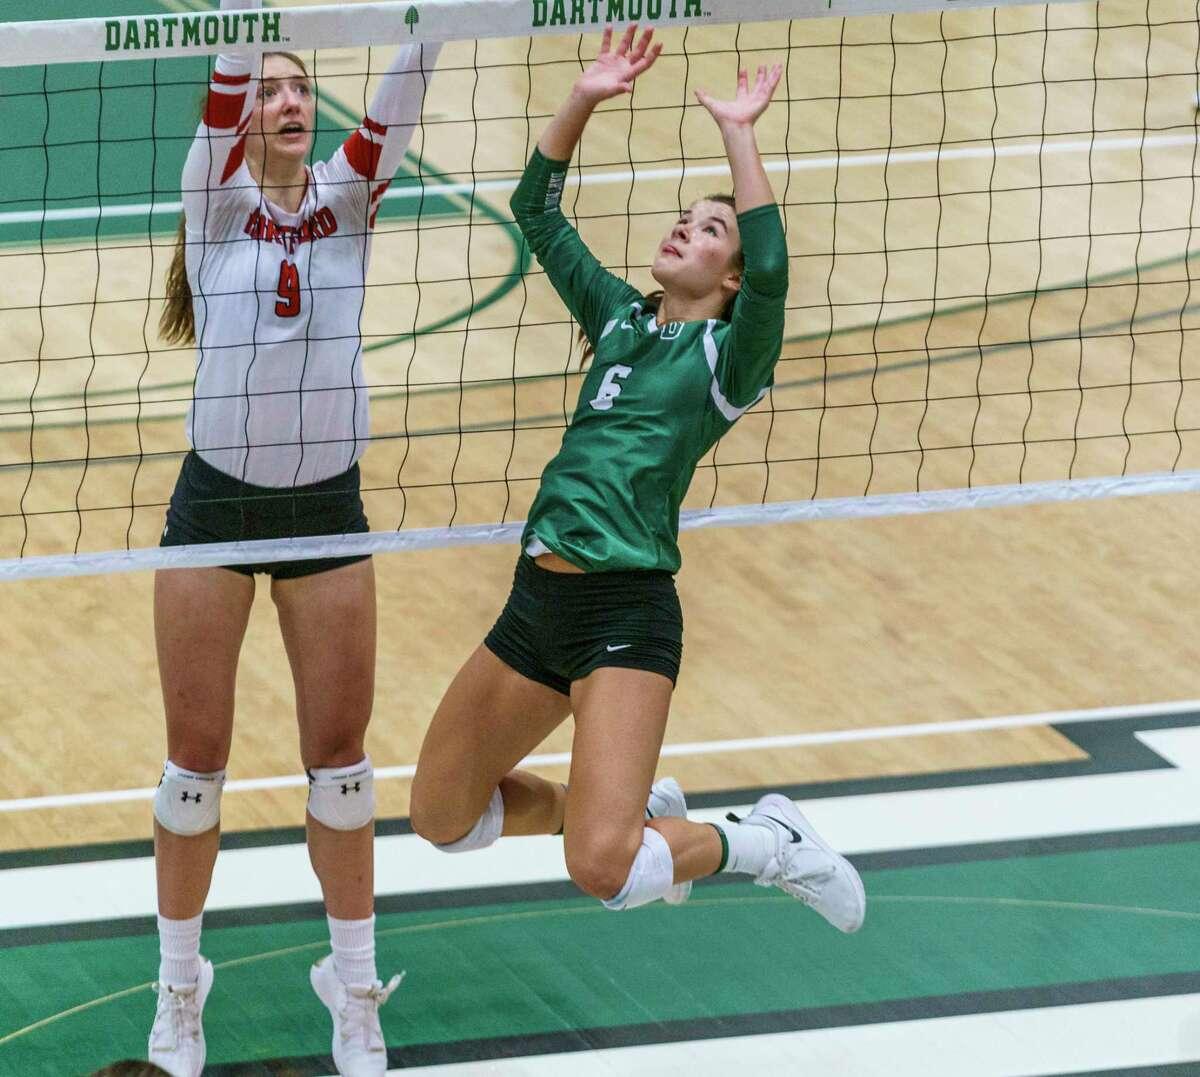 Dartmouth volleyball player Kenzie Arent.